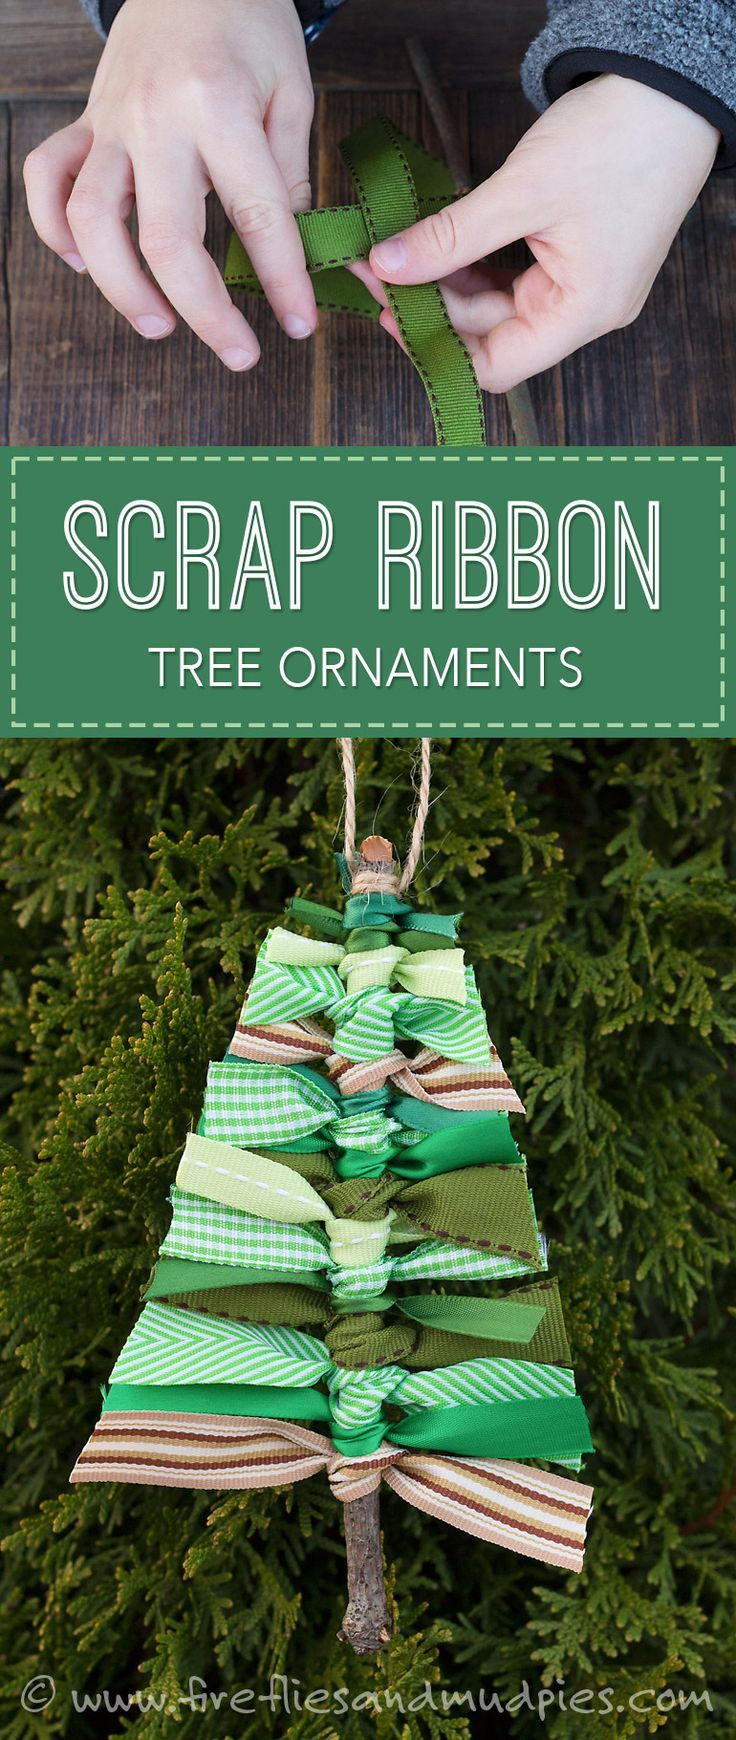 Scrap Ribbon Tree Ornaments   Fireflies and Mud Pies